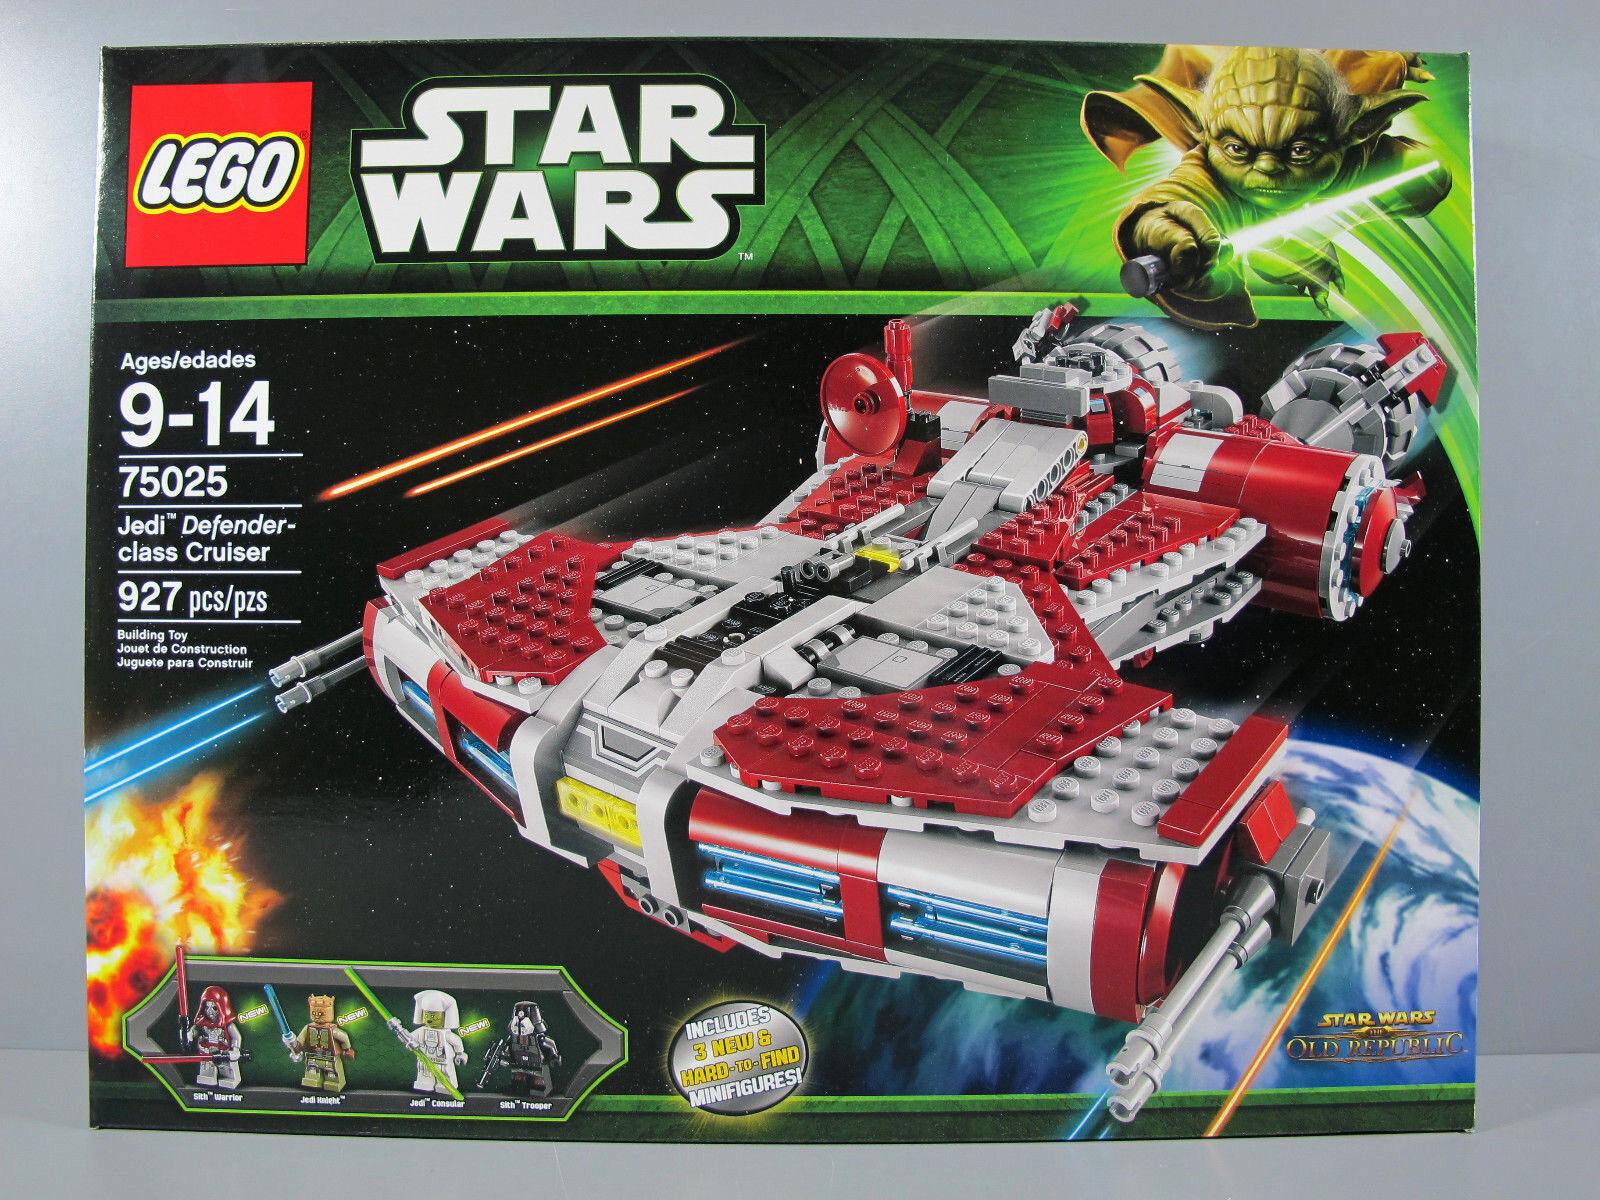 Nuevo Sellado Lego Star Wars 75025 Jedi Defender-class Cruiser